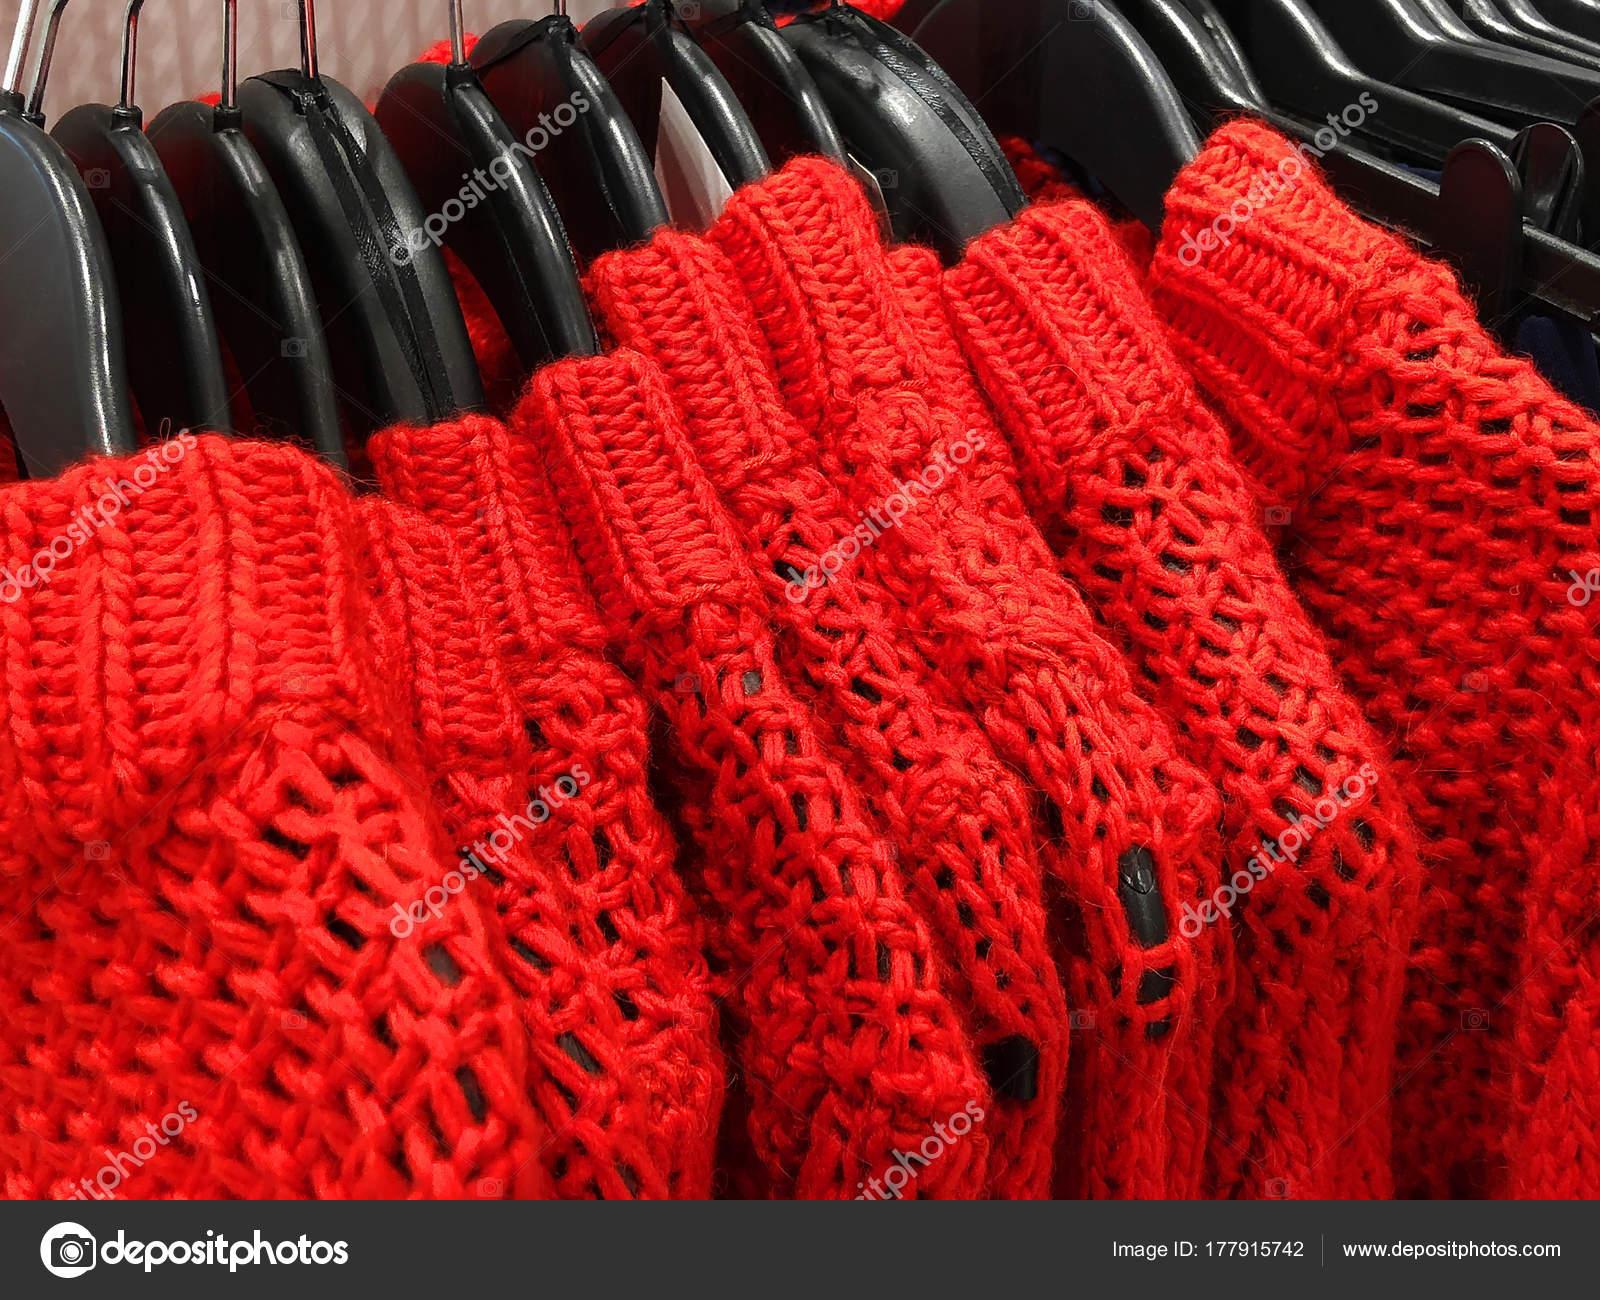 2777780aa4 Γυναικεία πουλόβερ σε κρεμάστρα στην αποθήκη. Ρούχα που κρέμονται σε ένα  ράφι σε ένα κατάστημα ρούχων — Εικόνα από Viculia